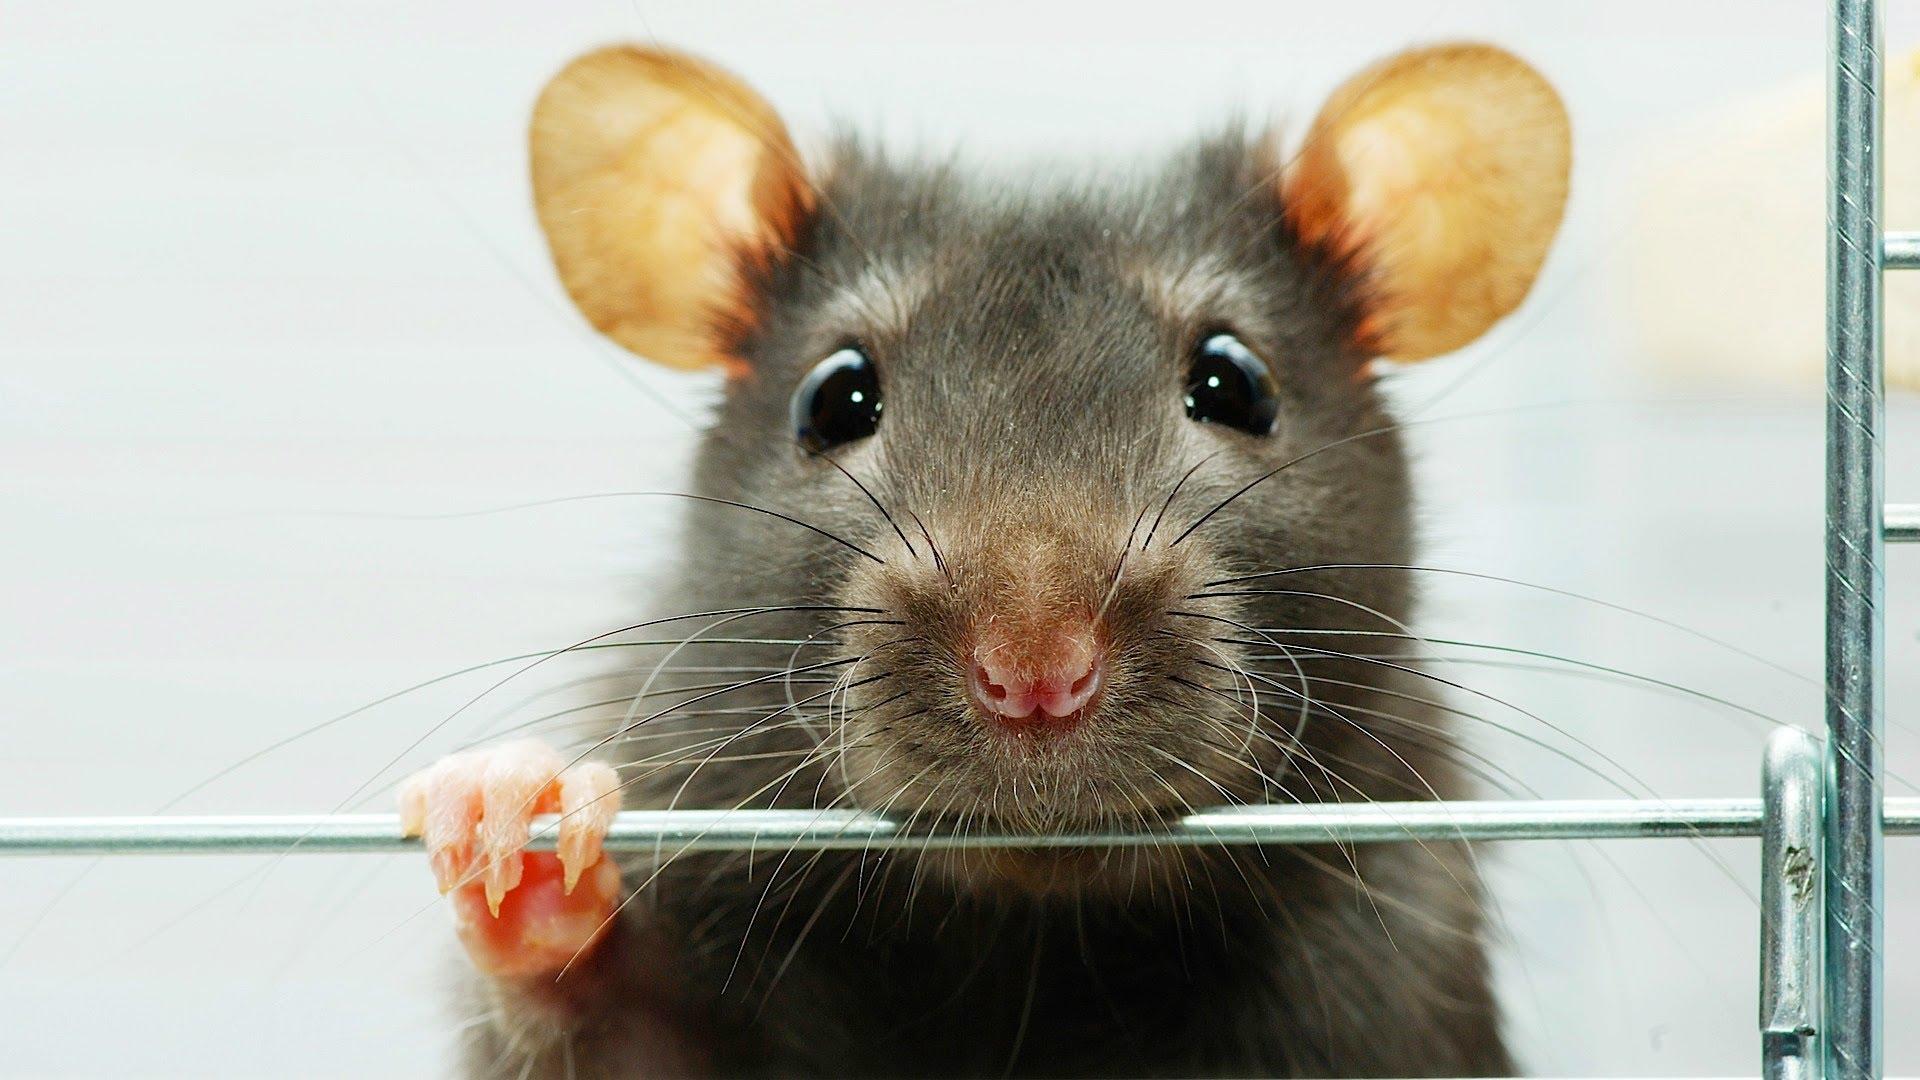 Кинг, картинка смешной мыши